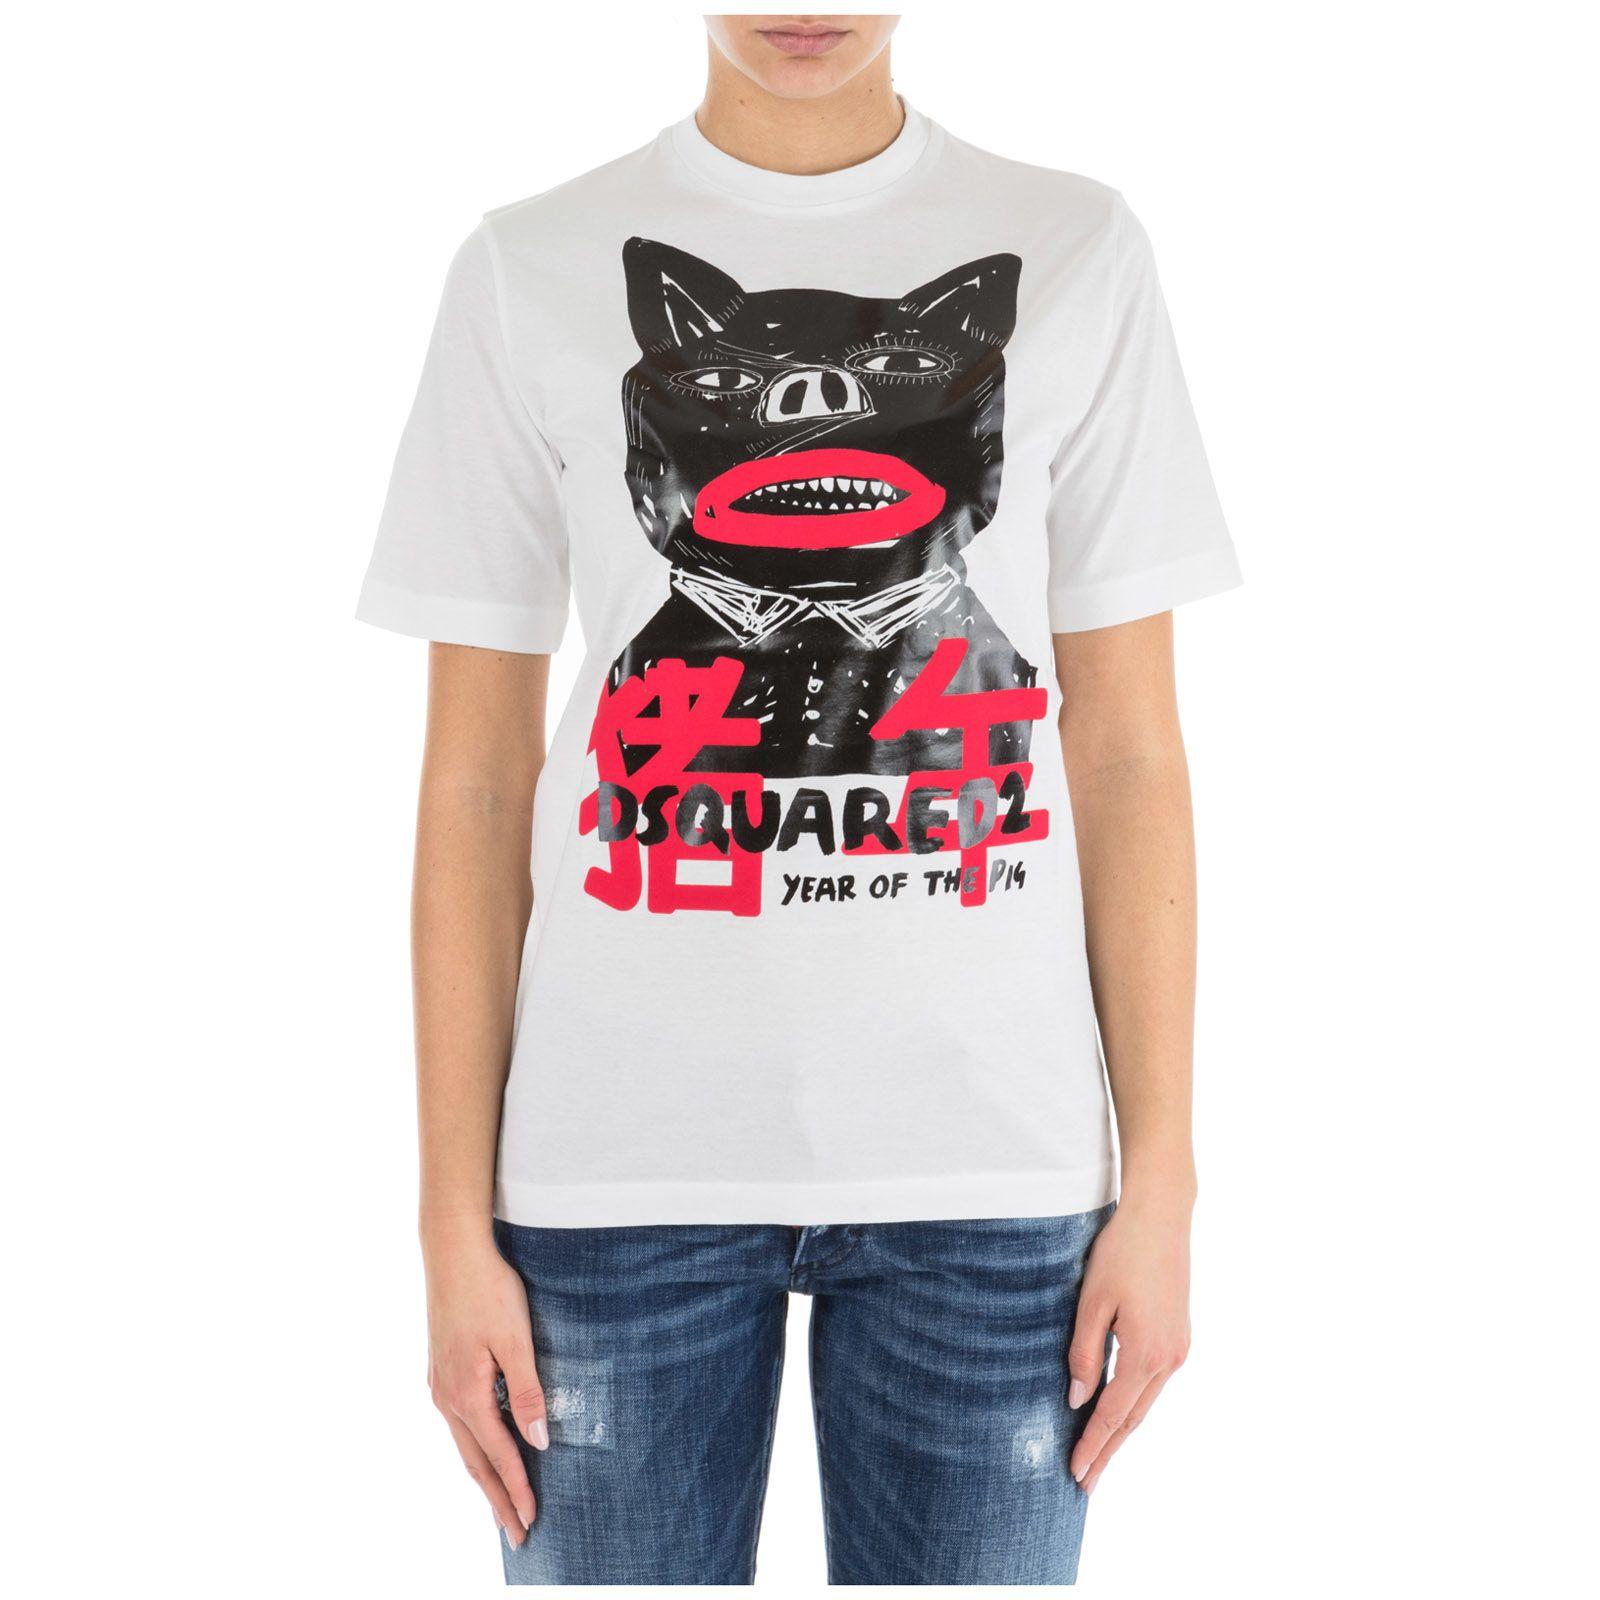 Dsquared2 T-shirt Short Sleeve Crew Neck Round Pig Punk